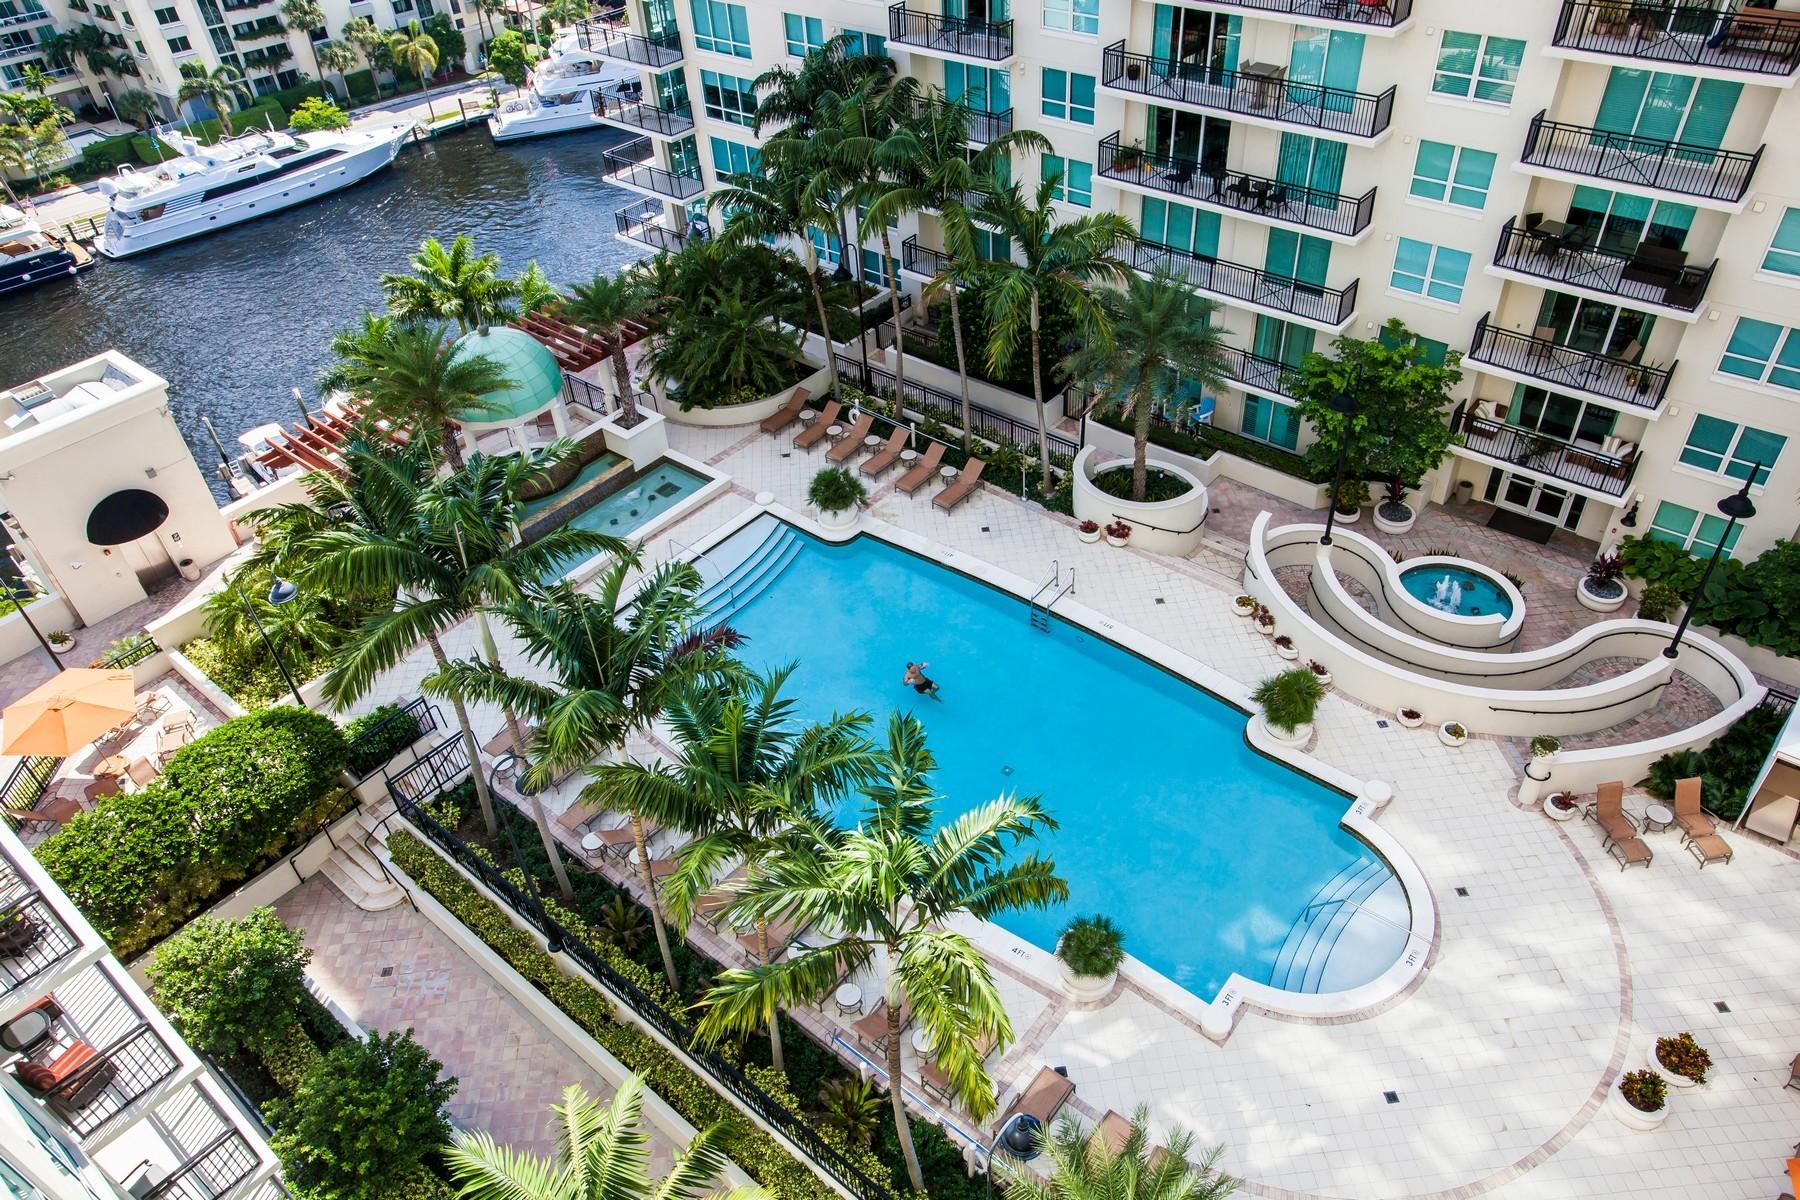 vì Bán tại 610 W Las Olas Bl #1519N 610 W Las Olas Bl 1519N Fort Lauderdale, Florida, 33312 Hoa Kỳ